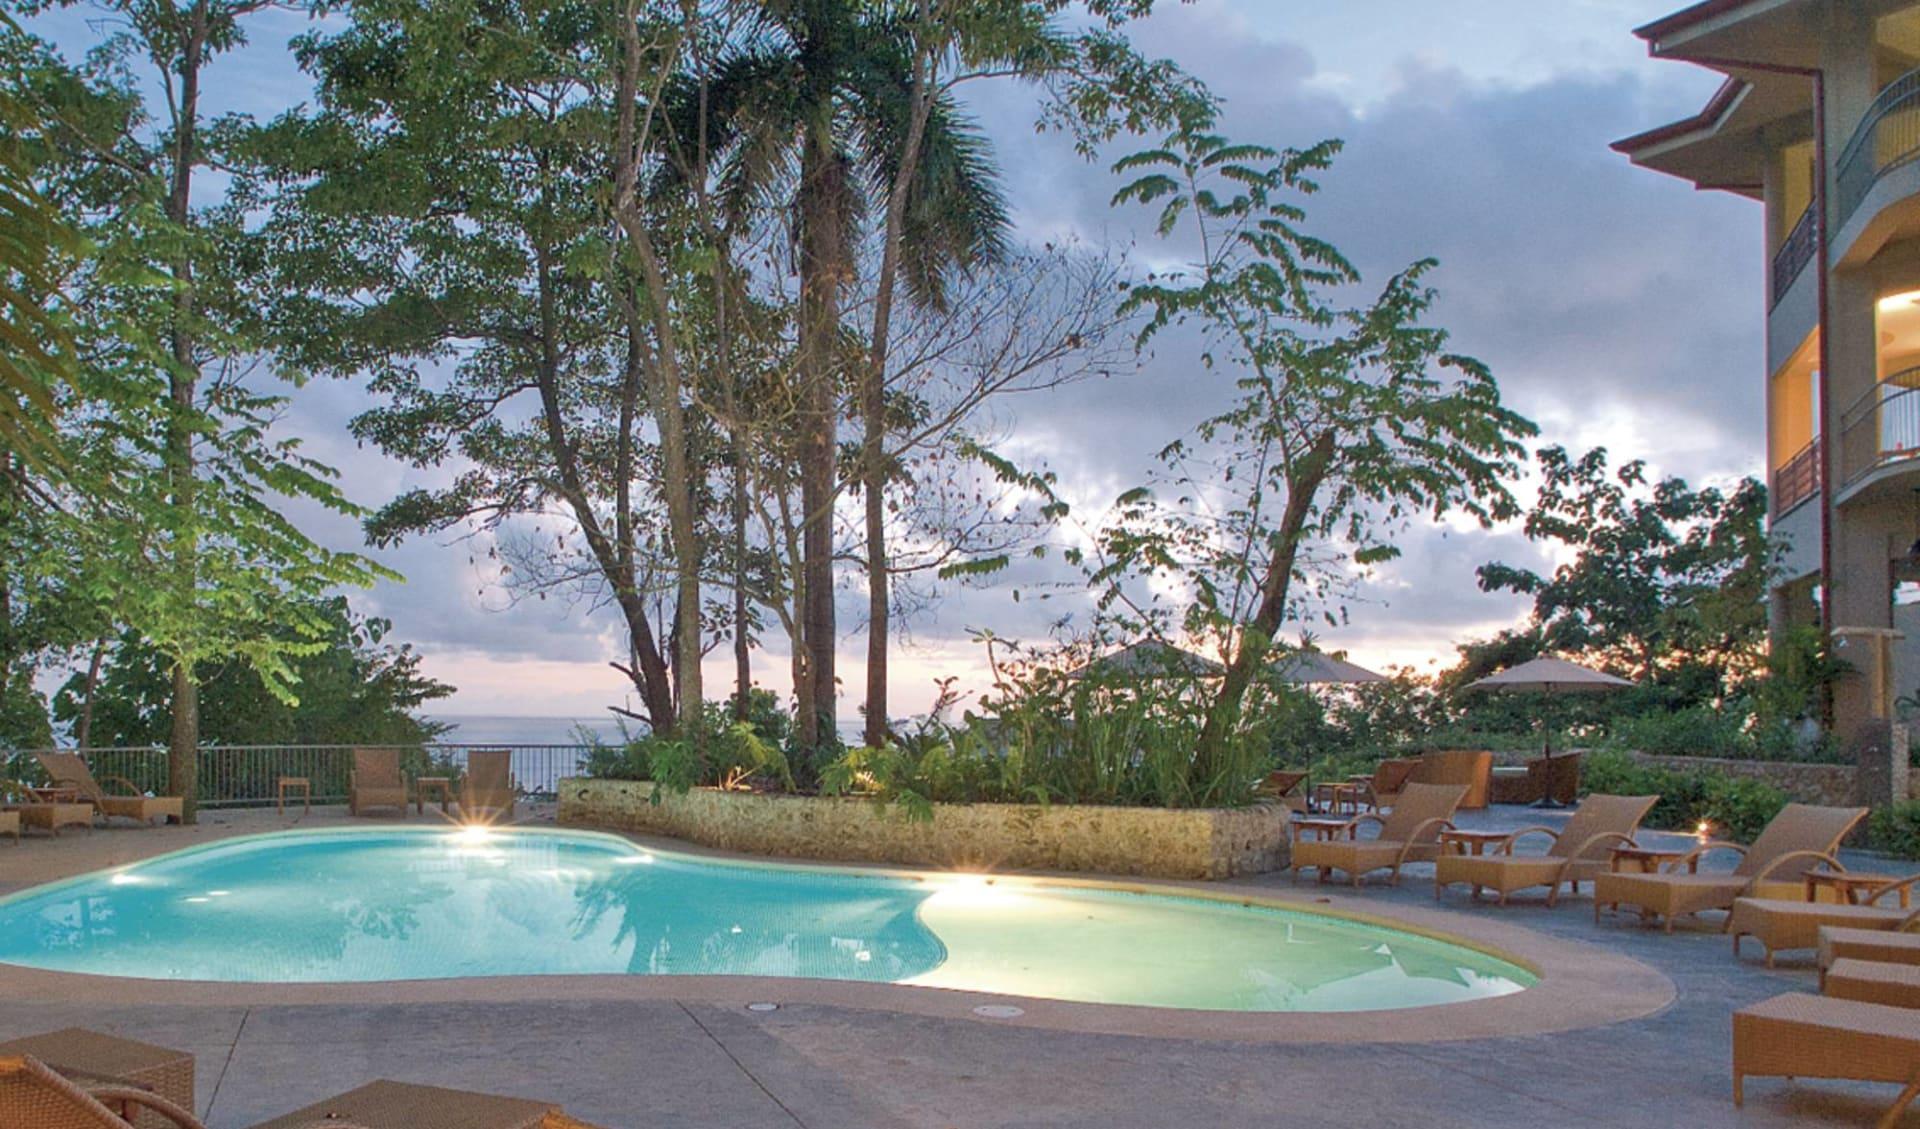 Arenas Del Mar Beachfront & Rainforest Resort in Manuel Antonio: pool arenas del mar pool